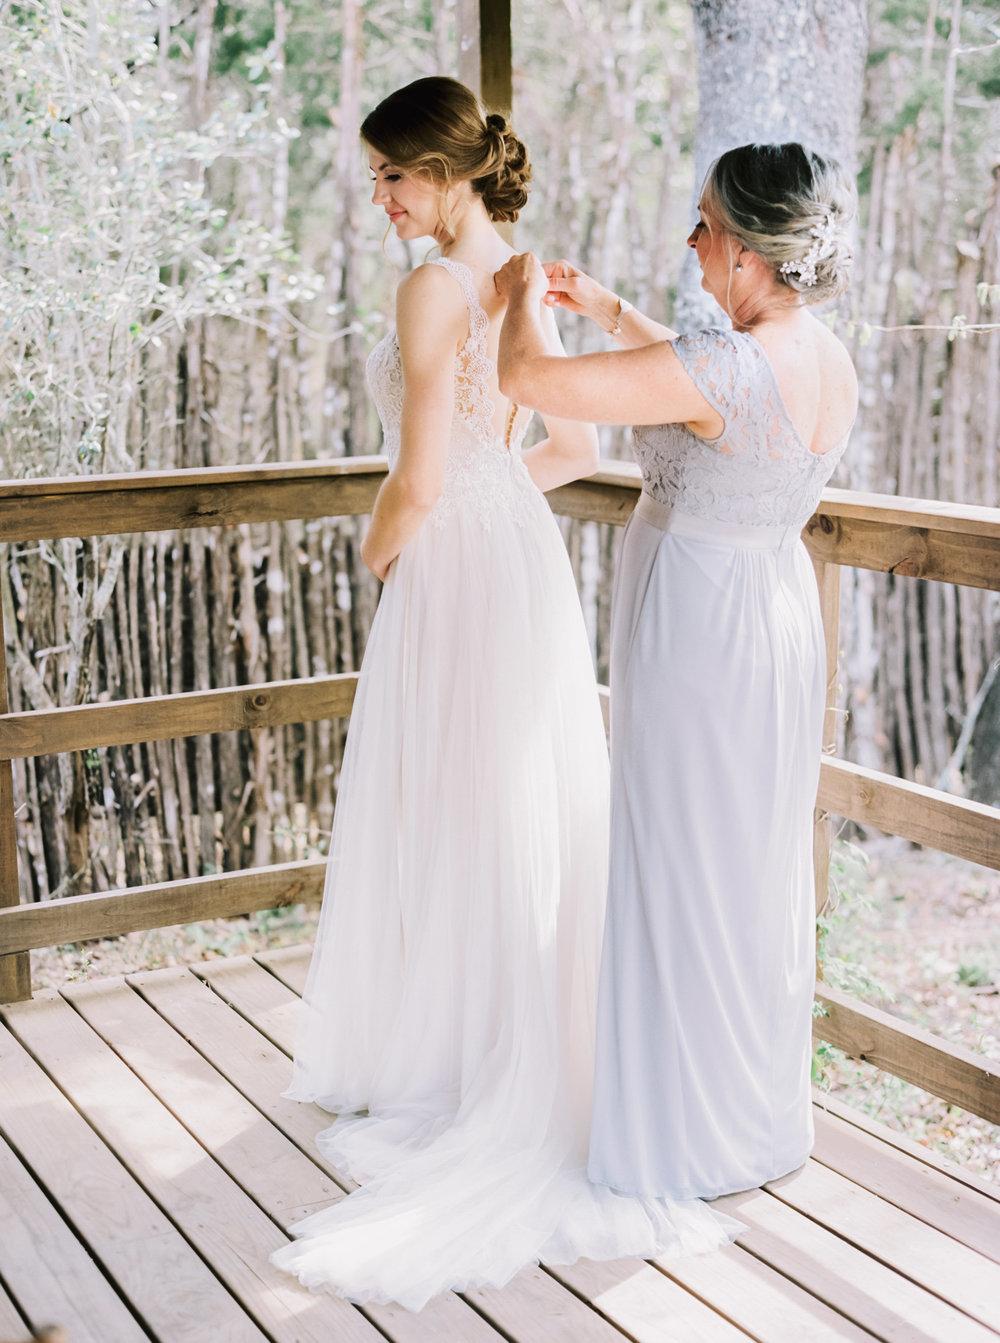 The-Creek-Haus-Wedding-Dripping-Springs-28.jpg